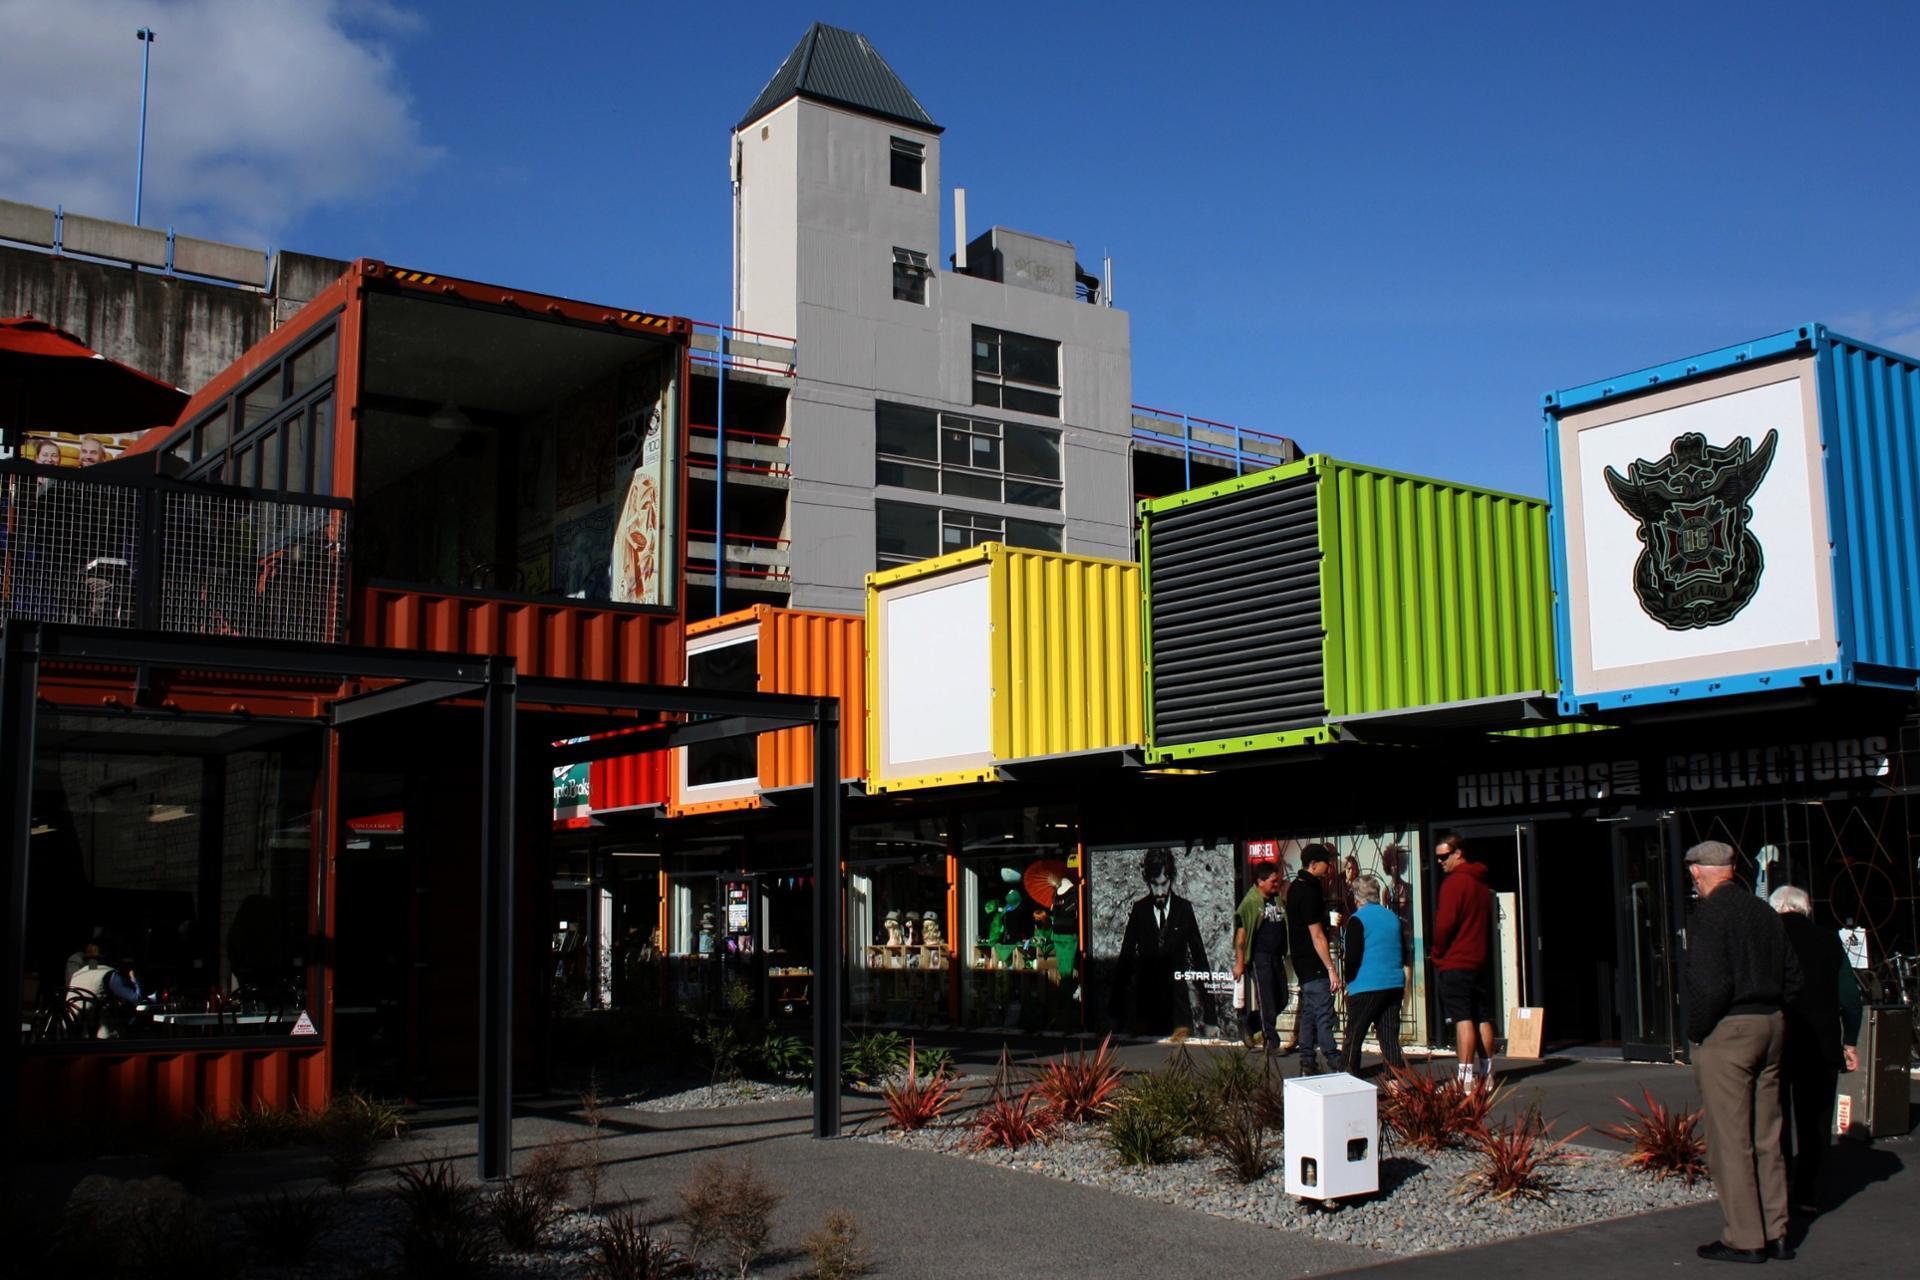 urbanisme en boîtes